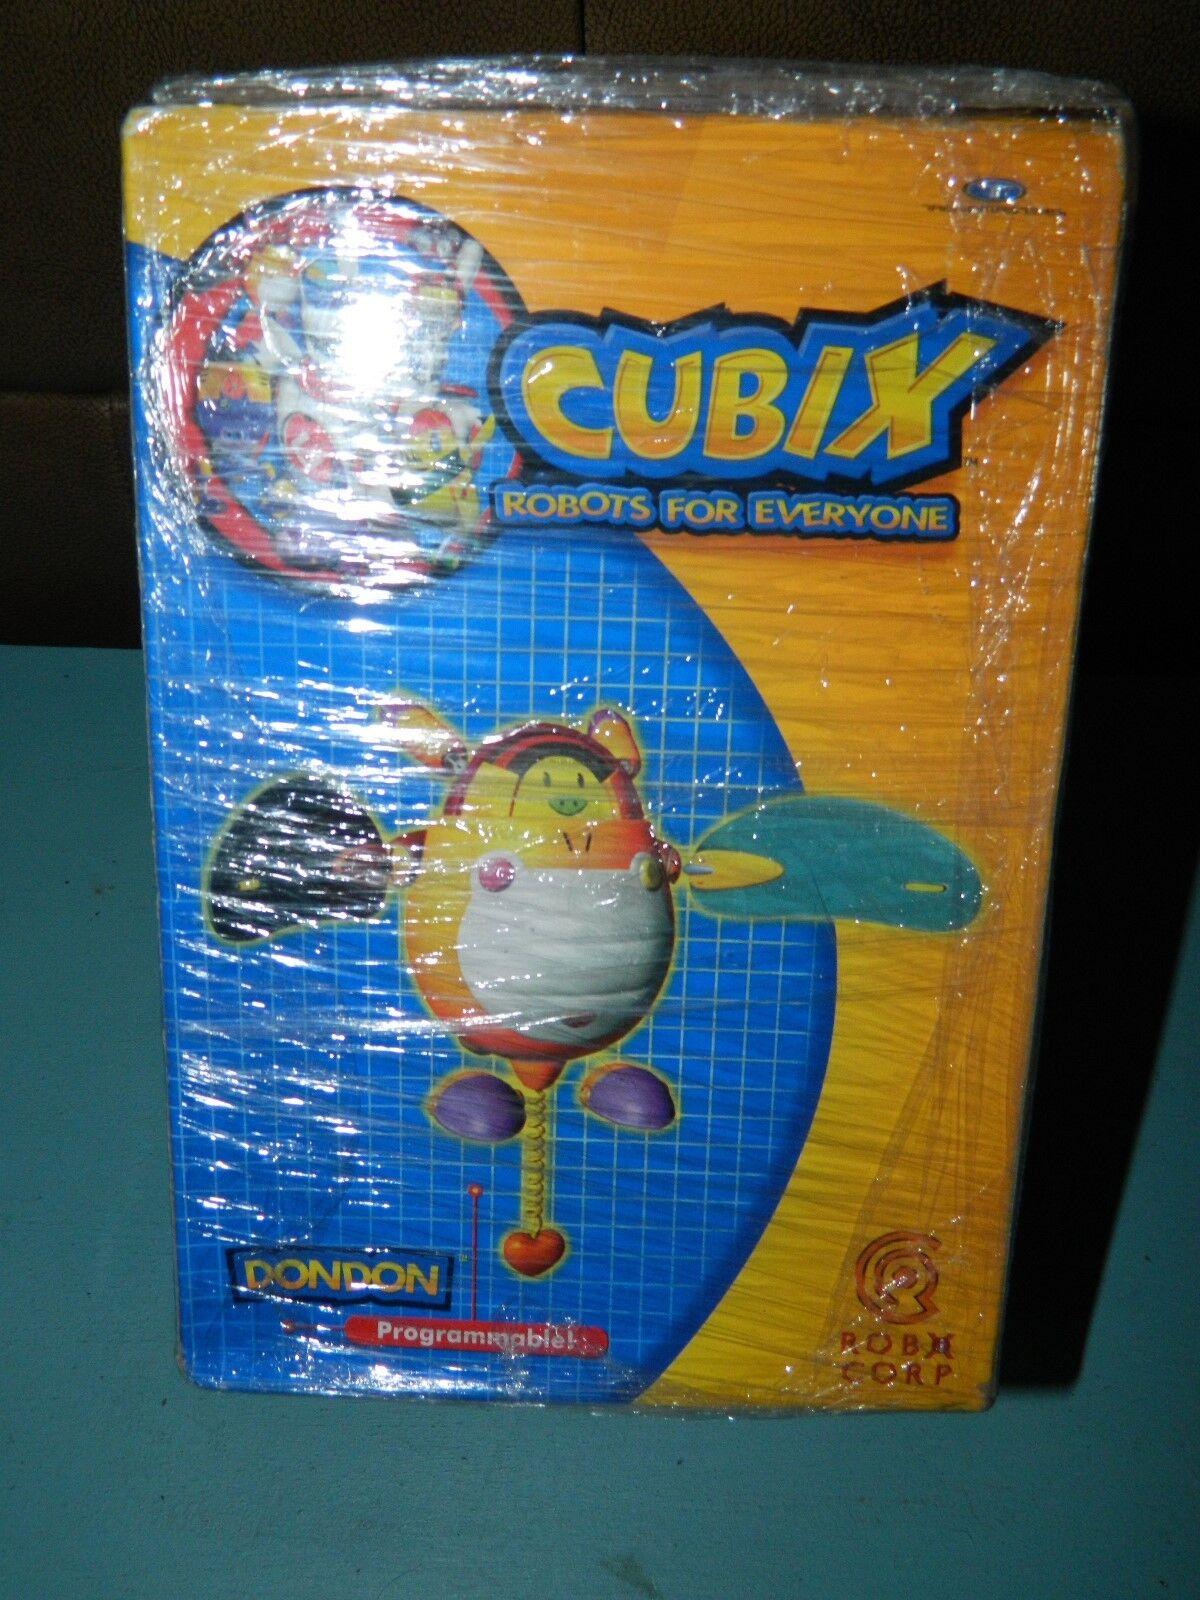 Cubix Don Don Programmable Robot Toy